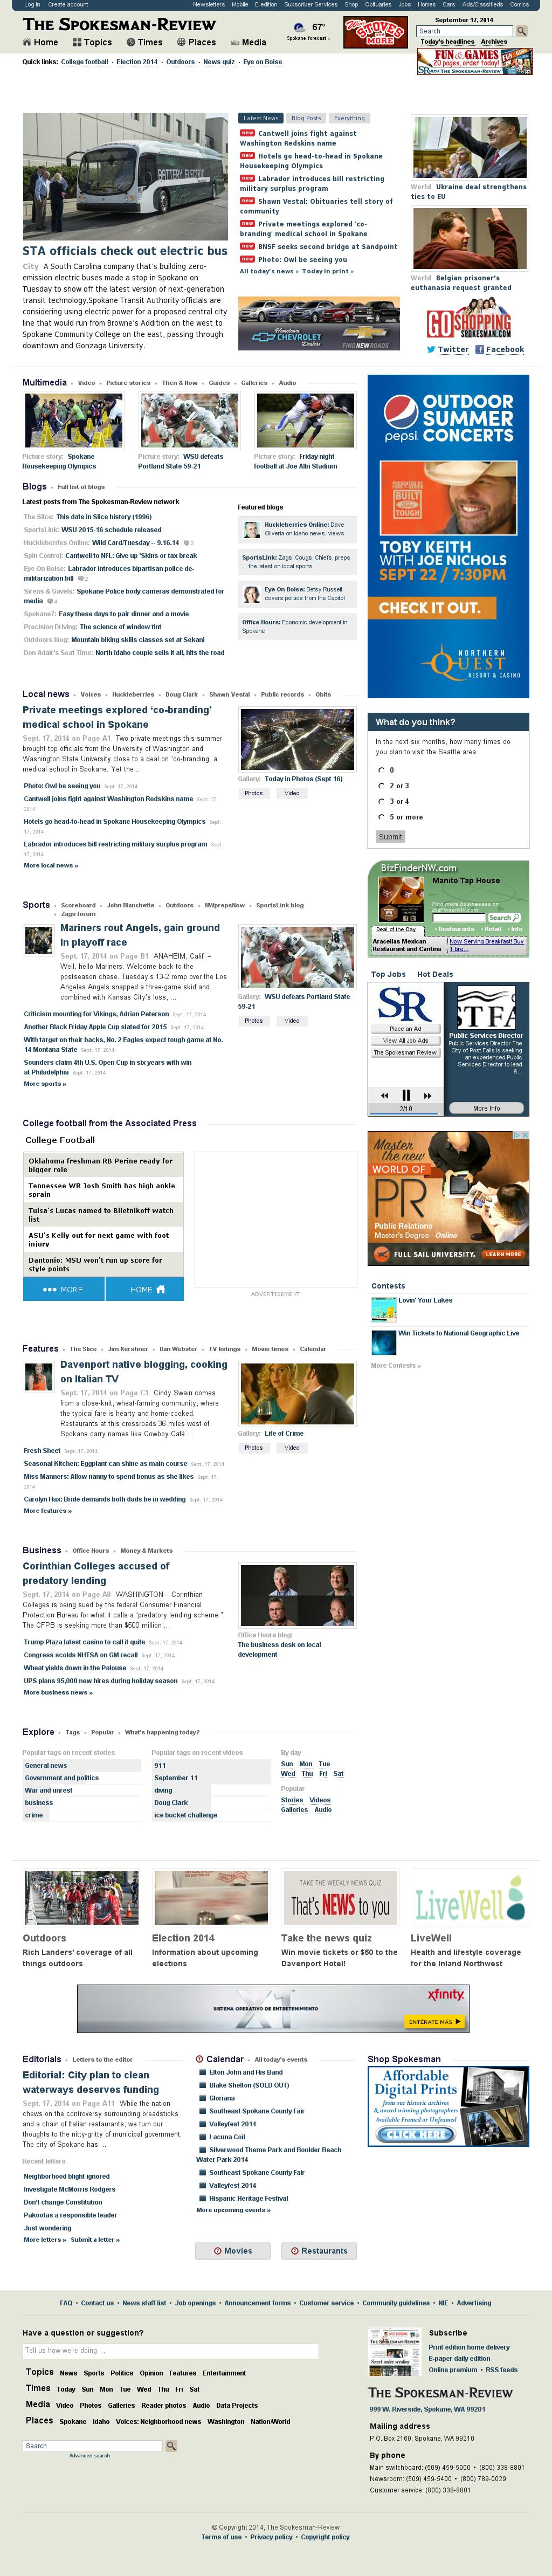 The (Spokane) Spokesman-Review at Wednesday Sept. 17, 2014, 7:20 a.m. UTC